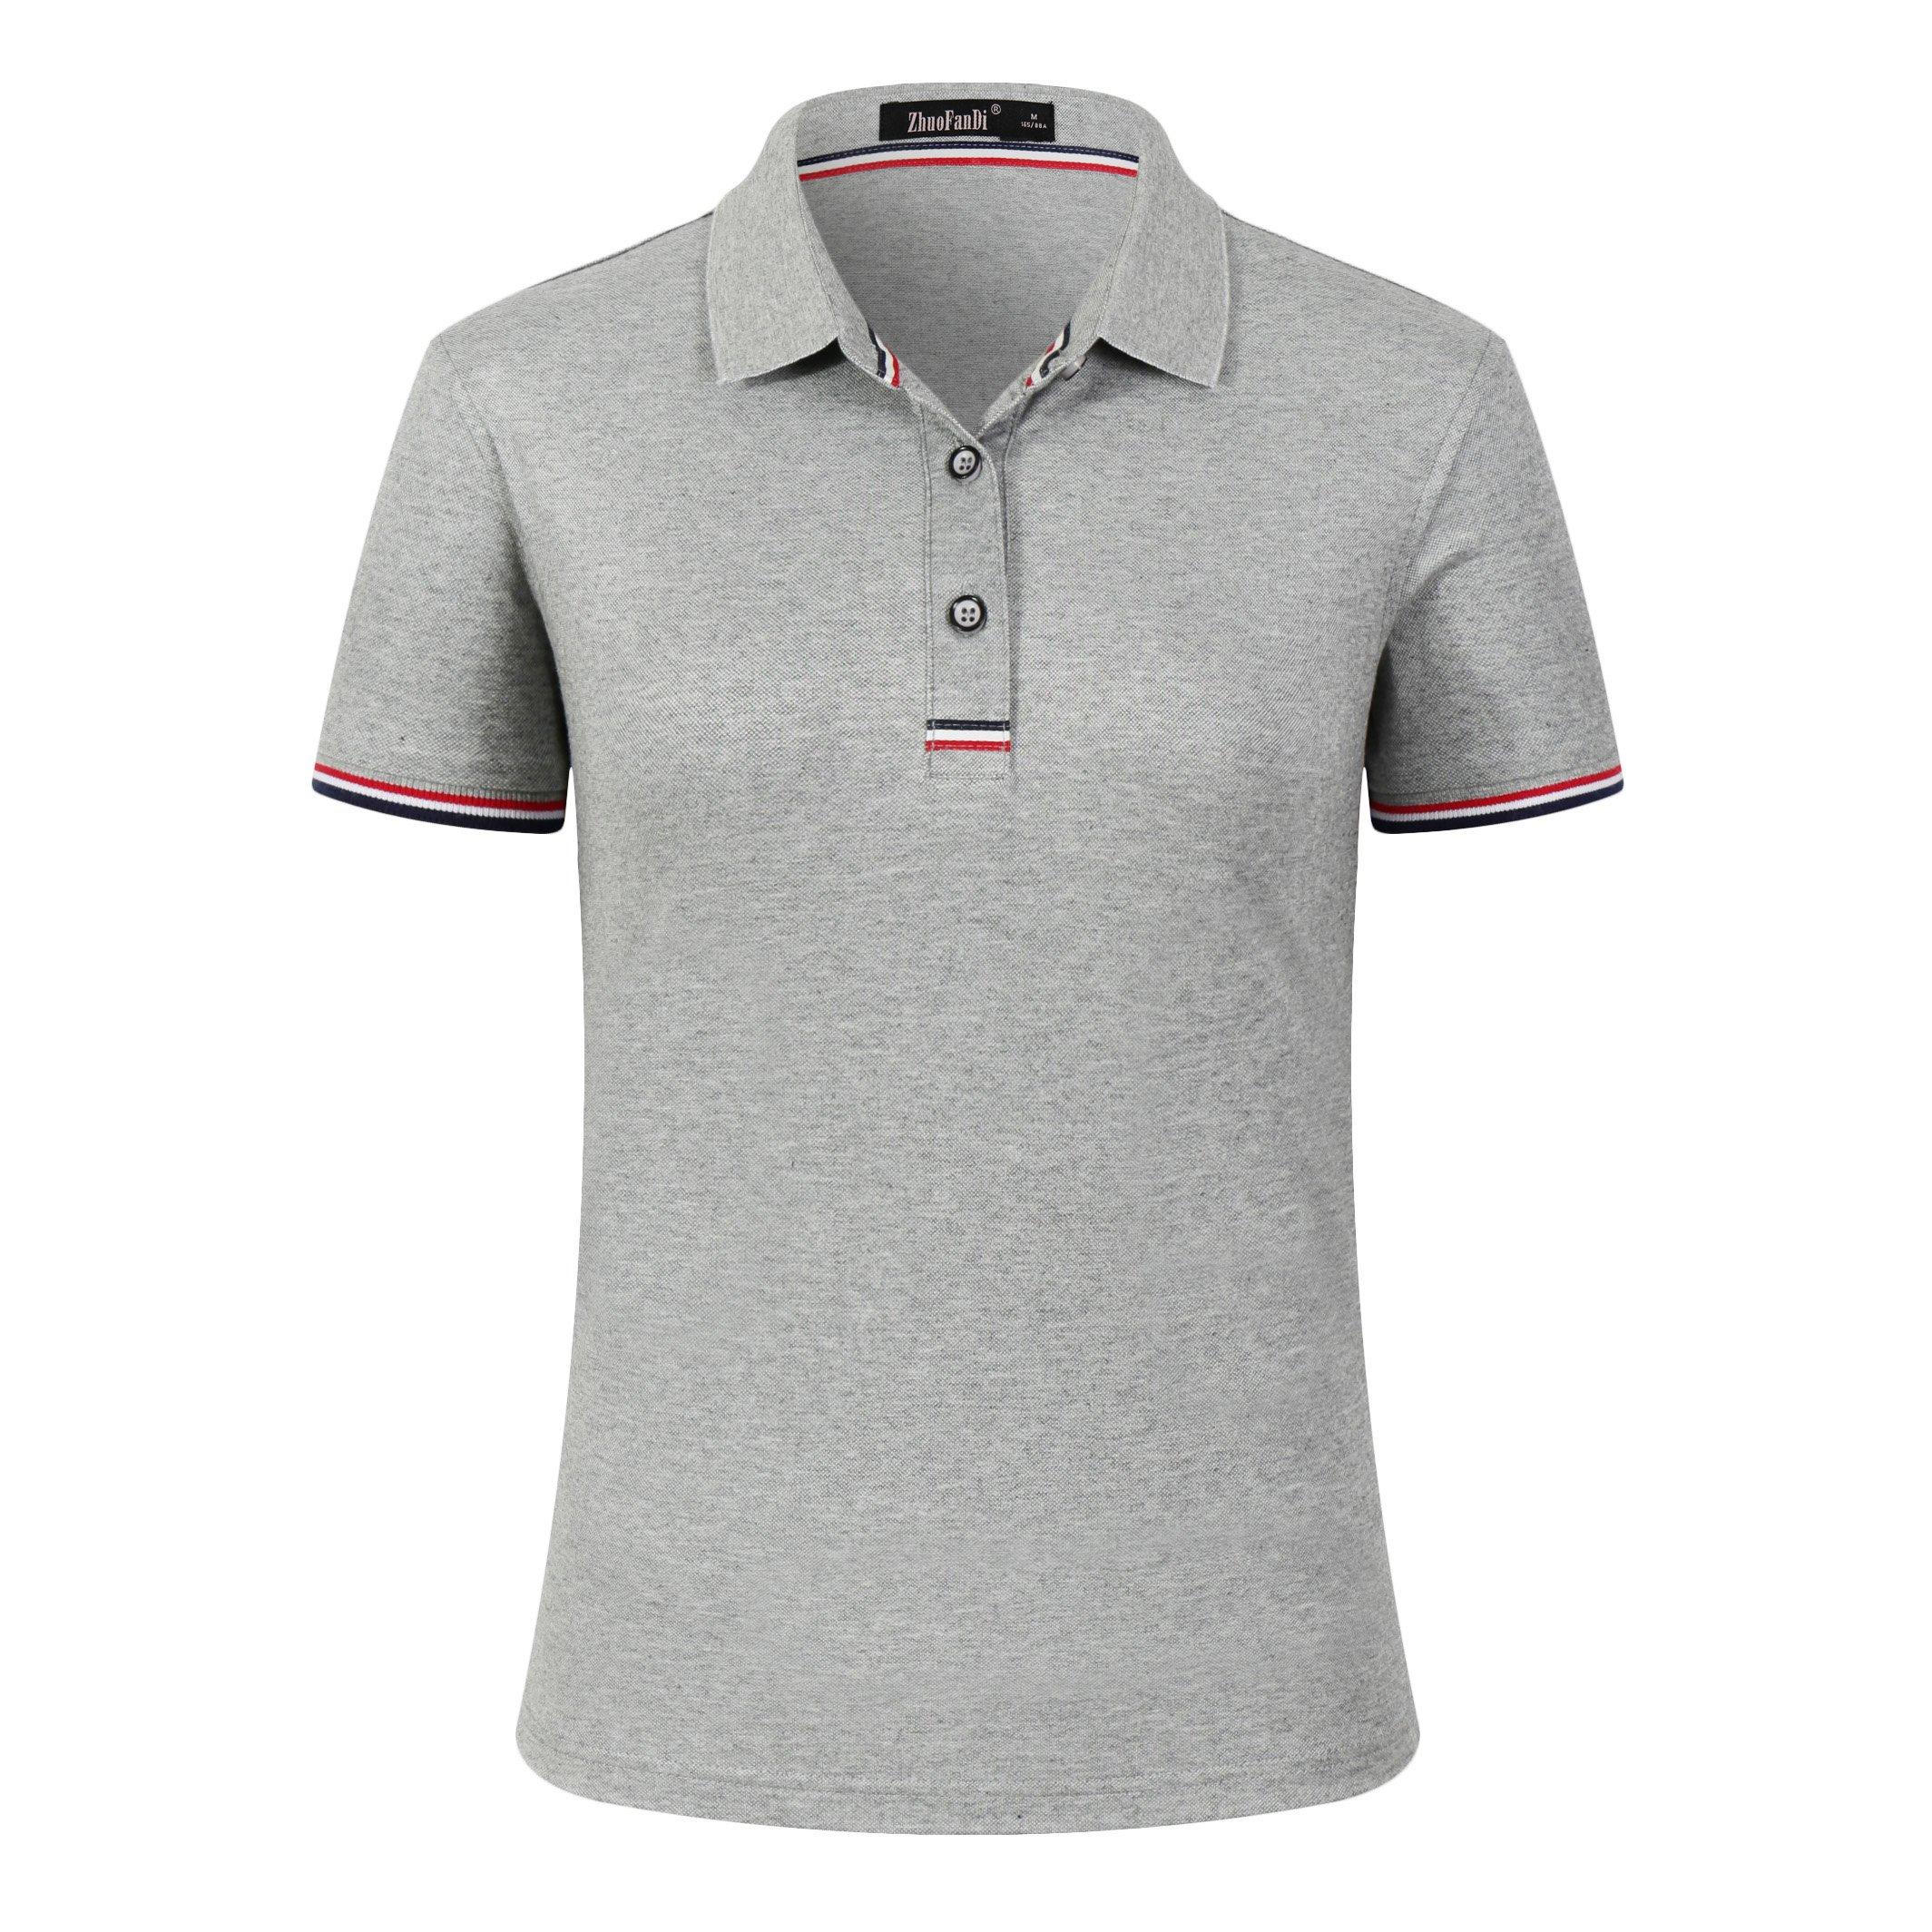 Mitario Femiego Women Classic Striped Collar Slim Fit Short Golf Polo Shirt Gray S